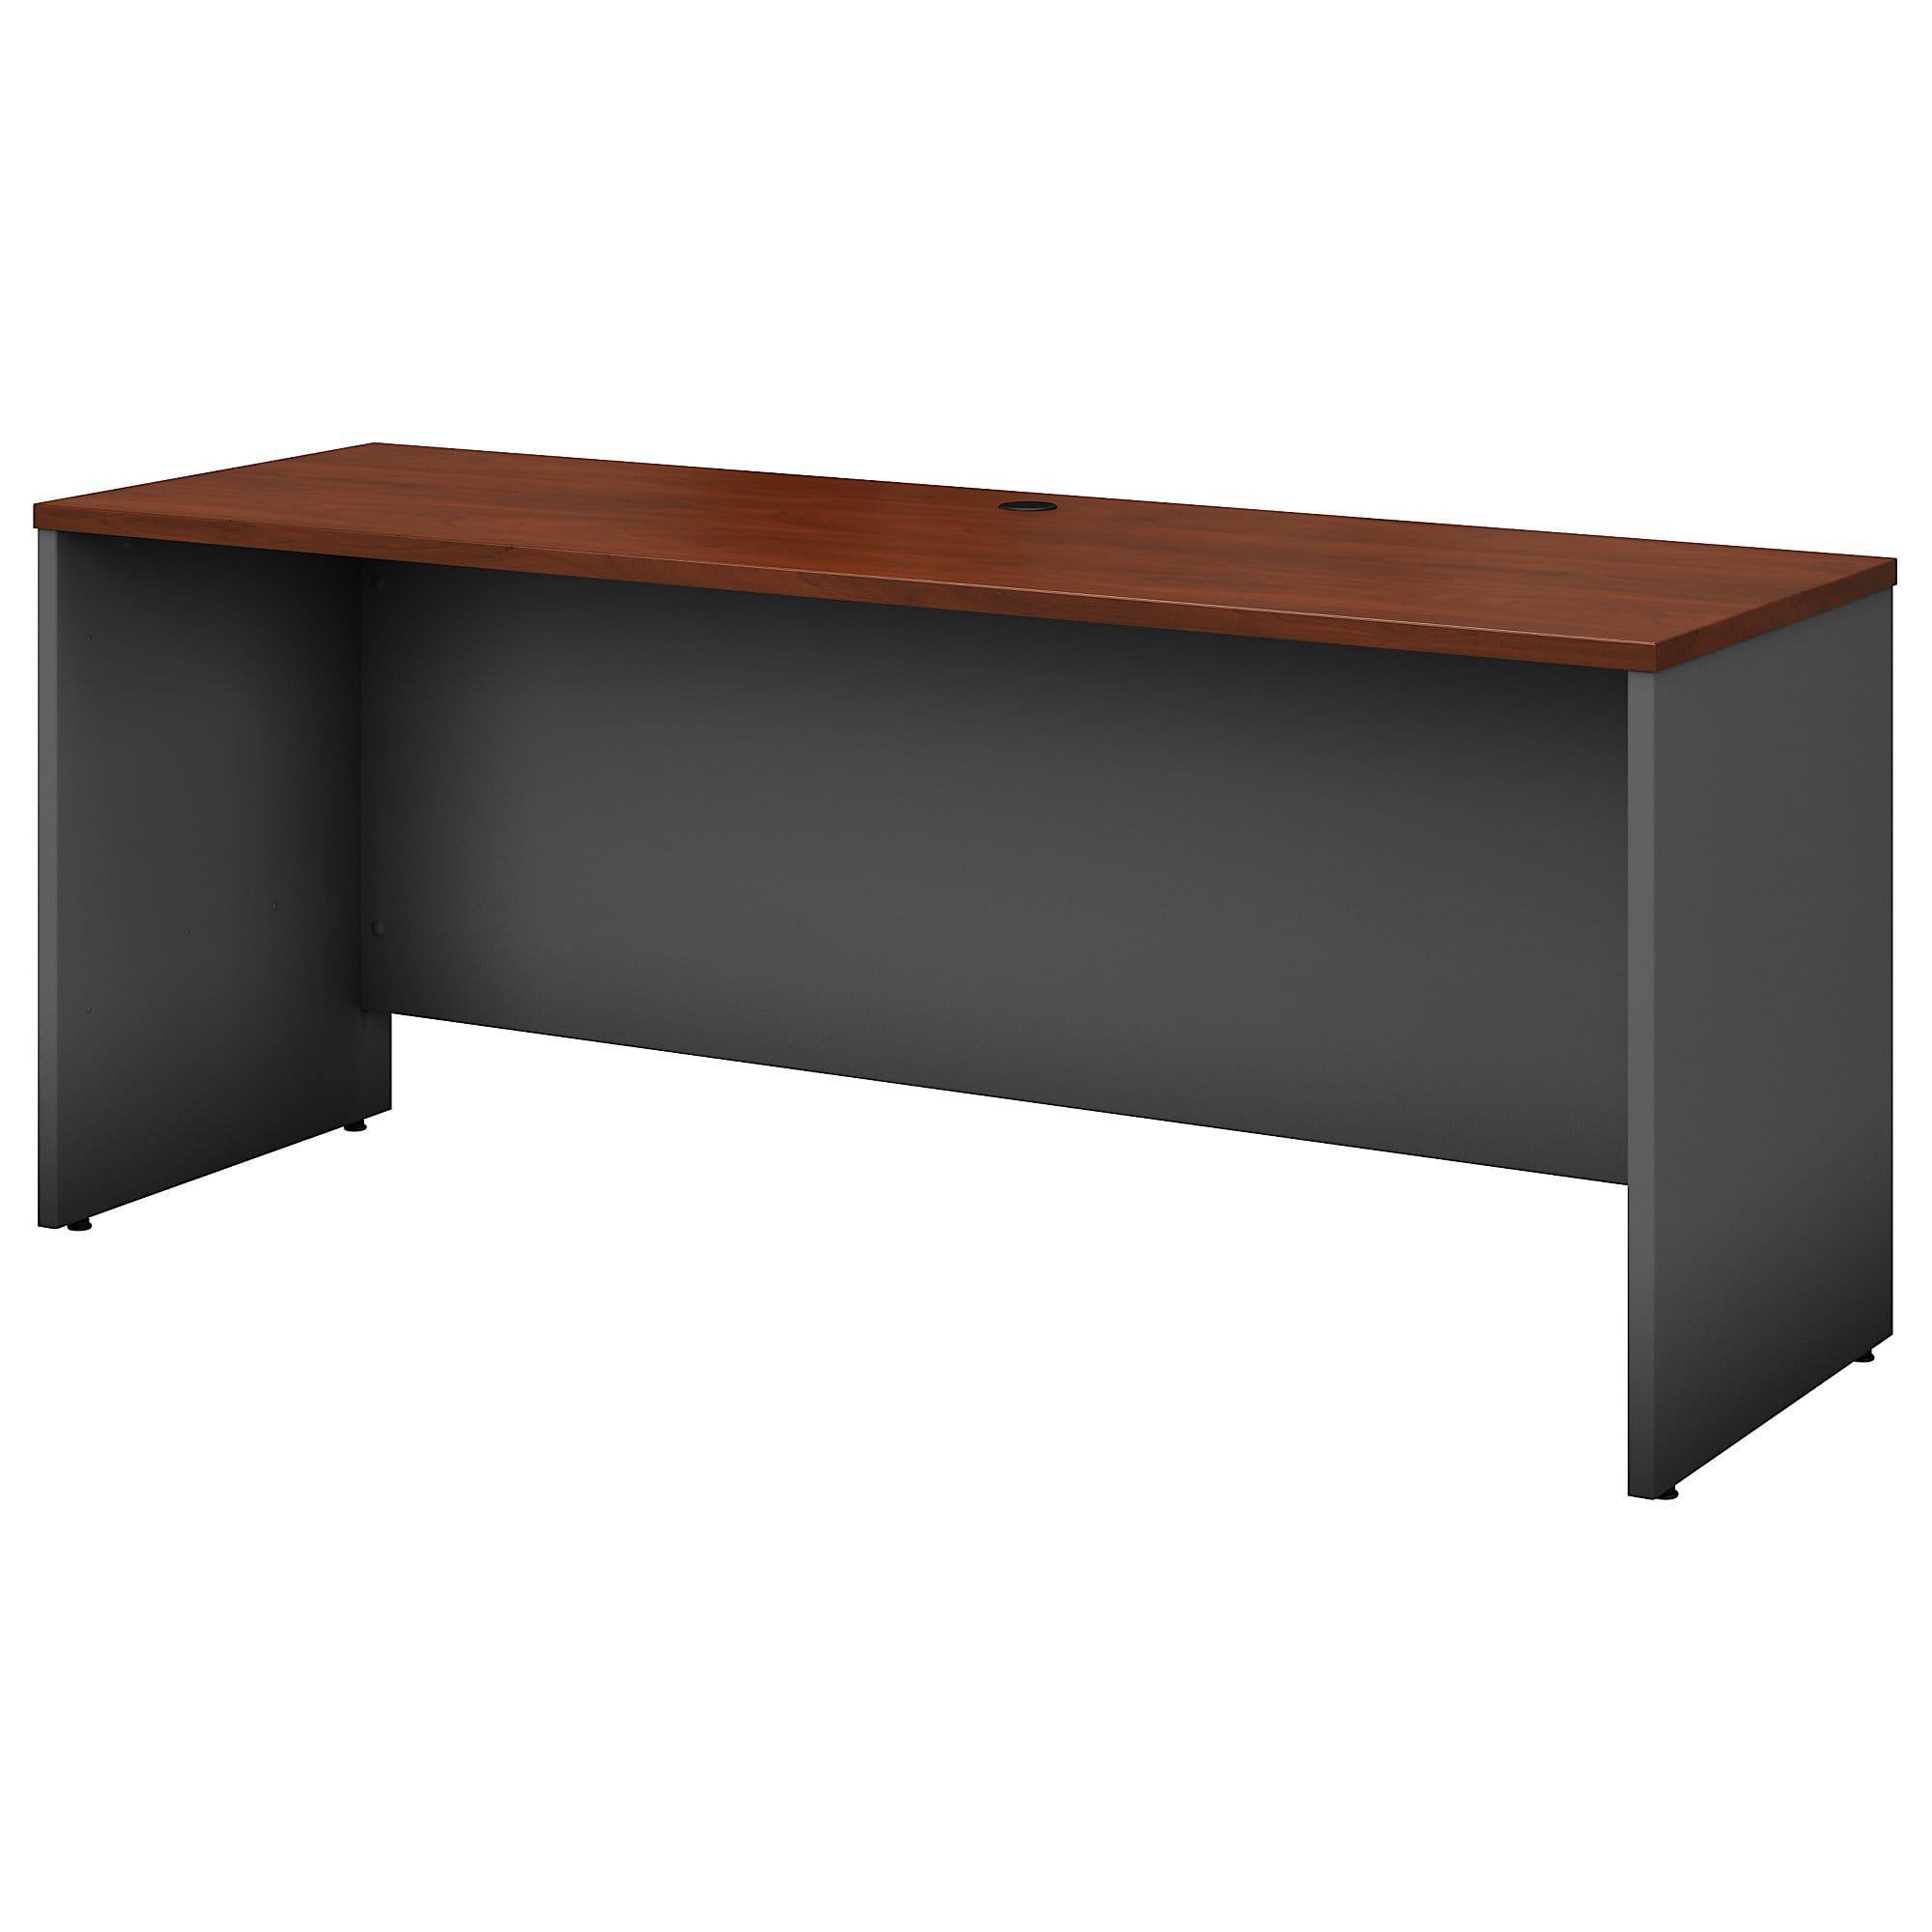 "Bush Business Furniture Components Credenza Desk 72""W x 24""D, Hansen Cherry/Graphite Gray, Premium Installation"